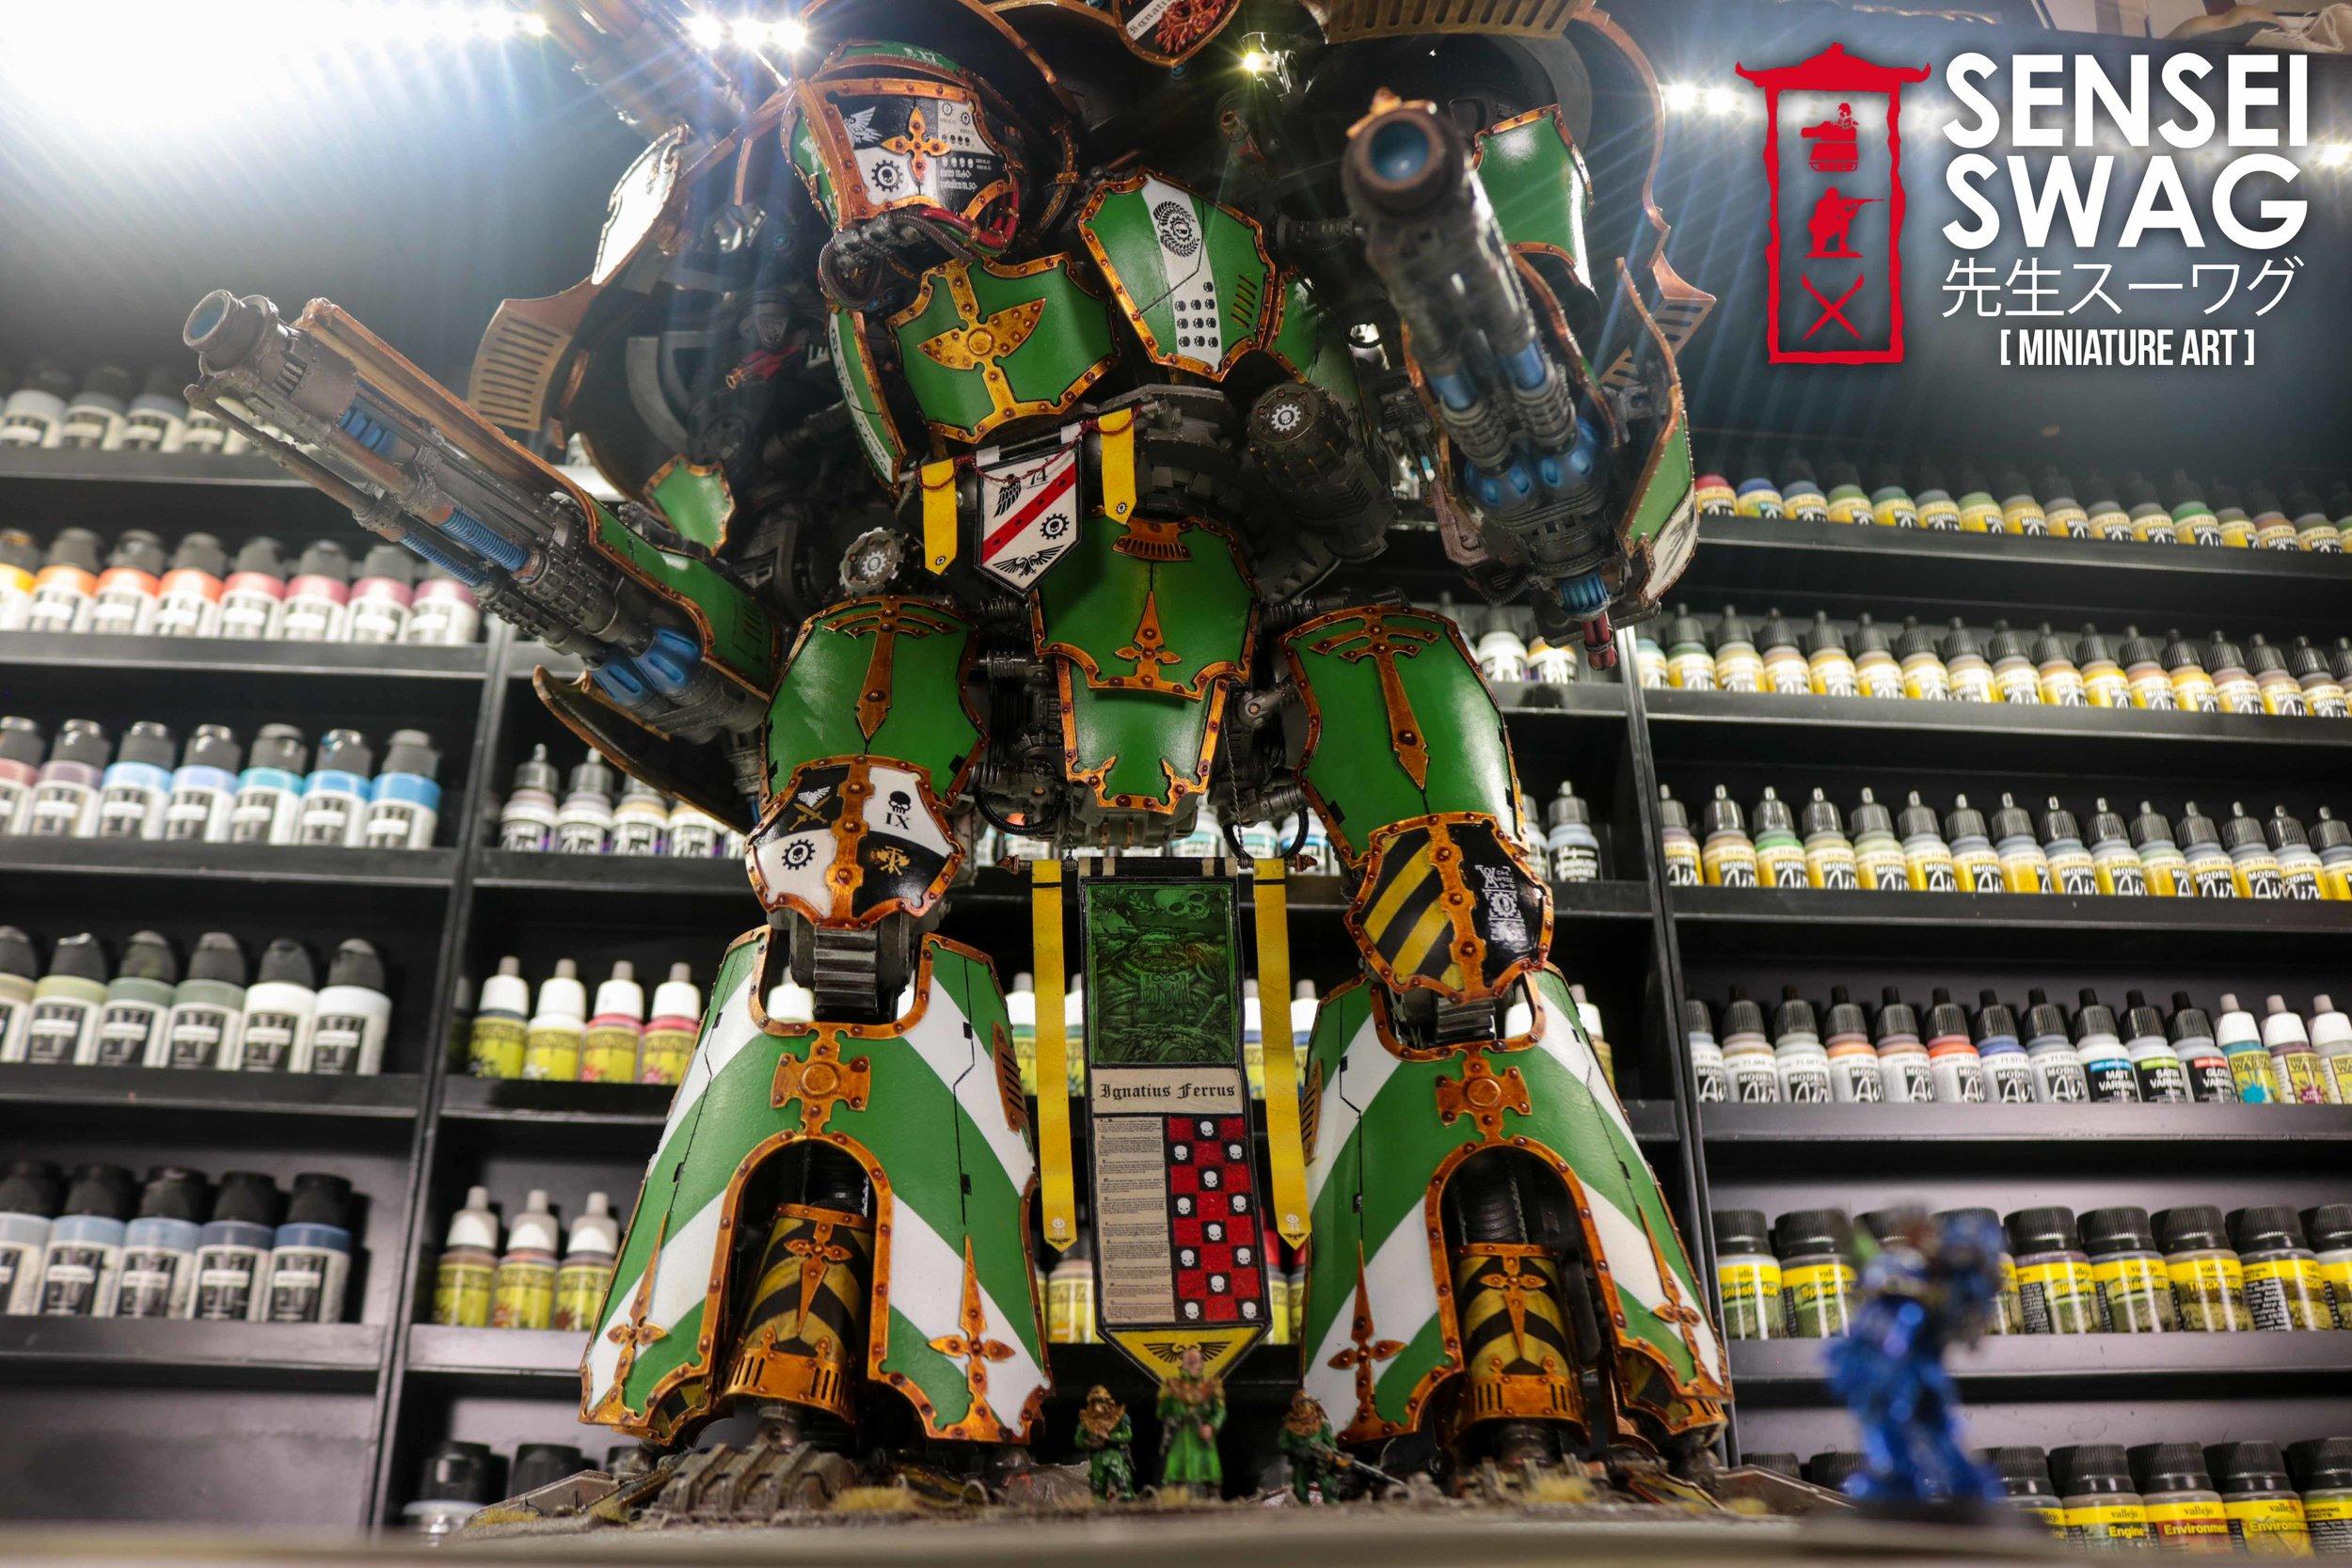 Legio Astraman Warlord Titan Forgeworld Warhammer 40k 30k-3.jpg